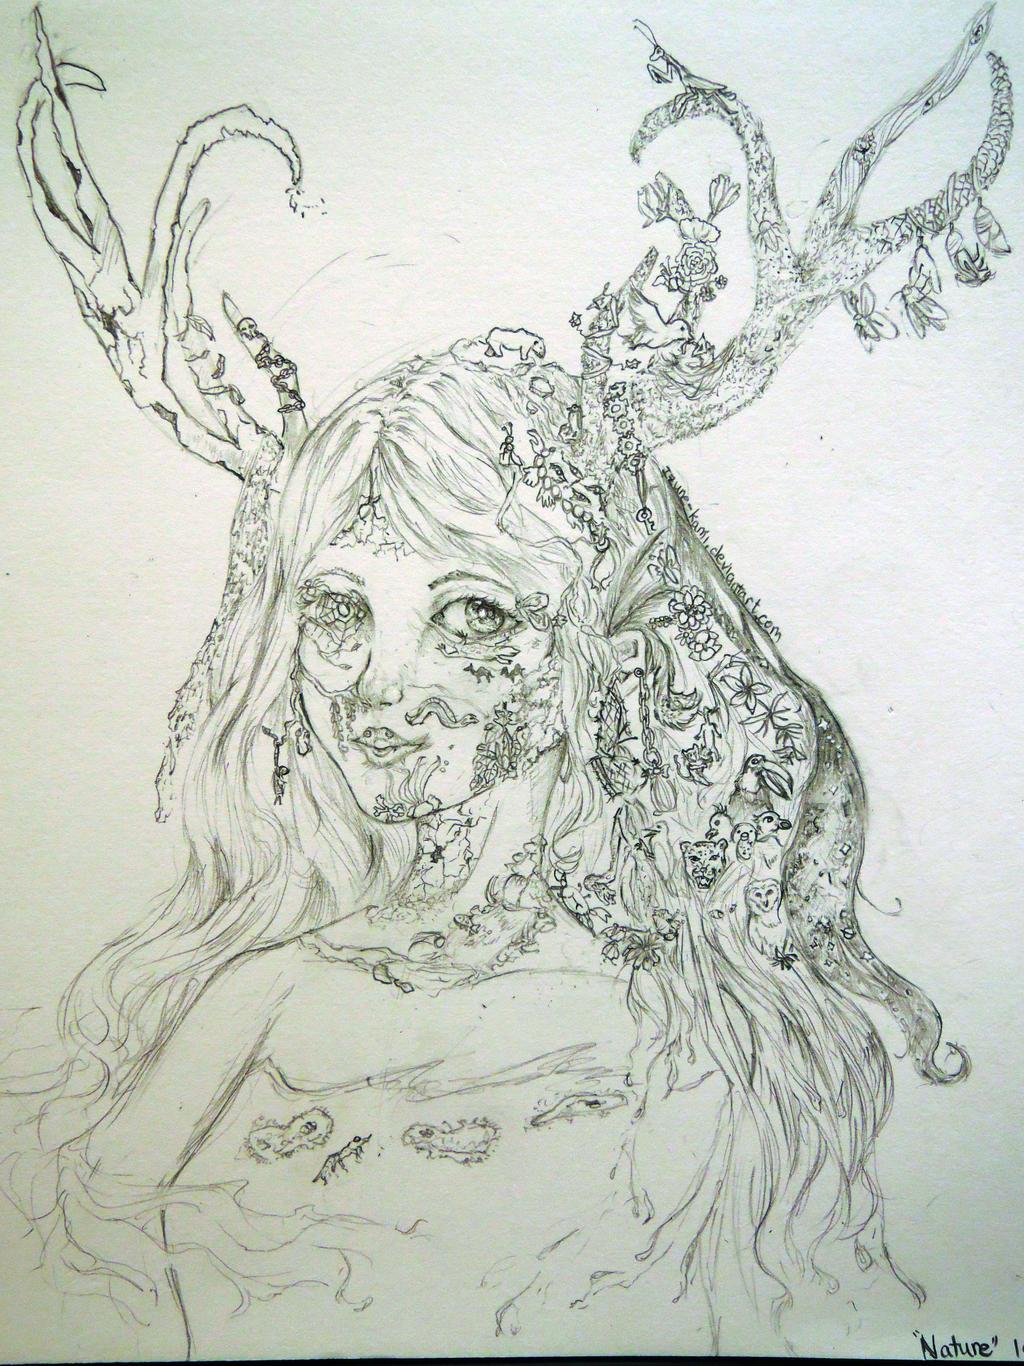 Nature ver. 2 - Closeup by miiandering